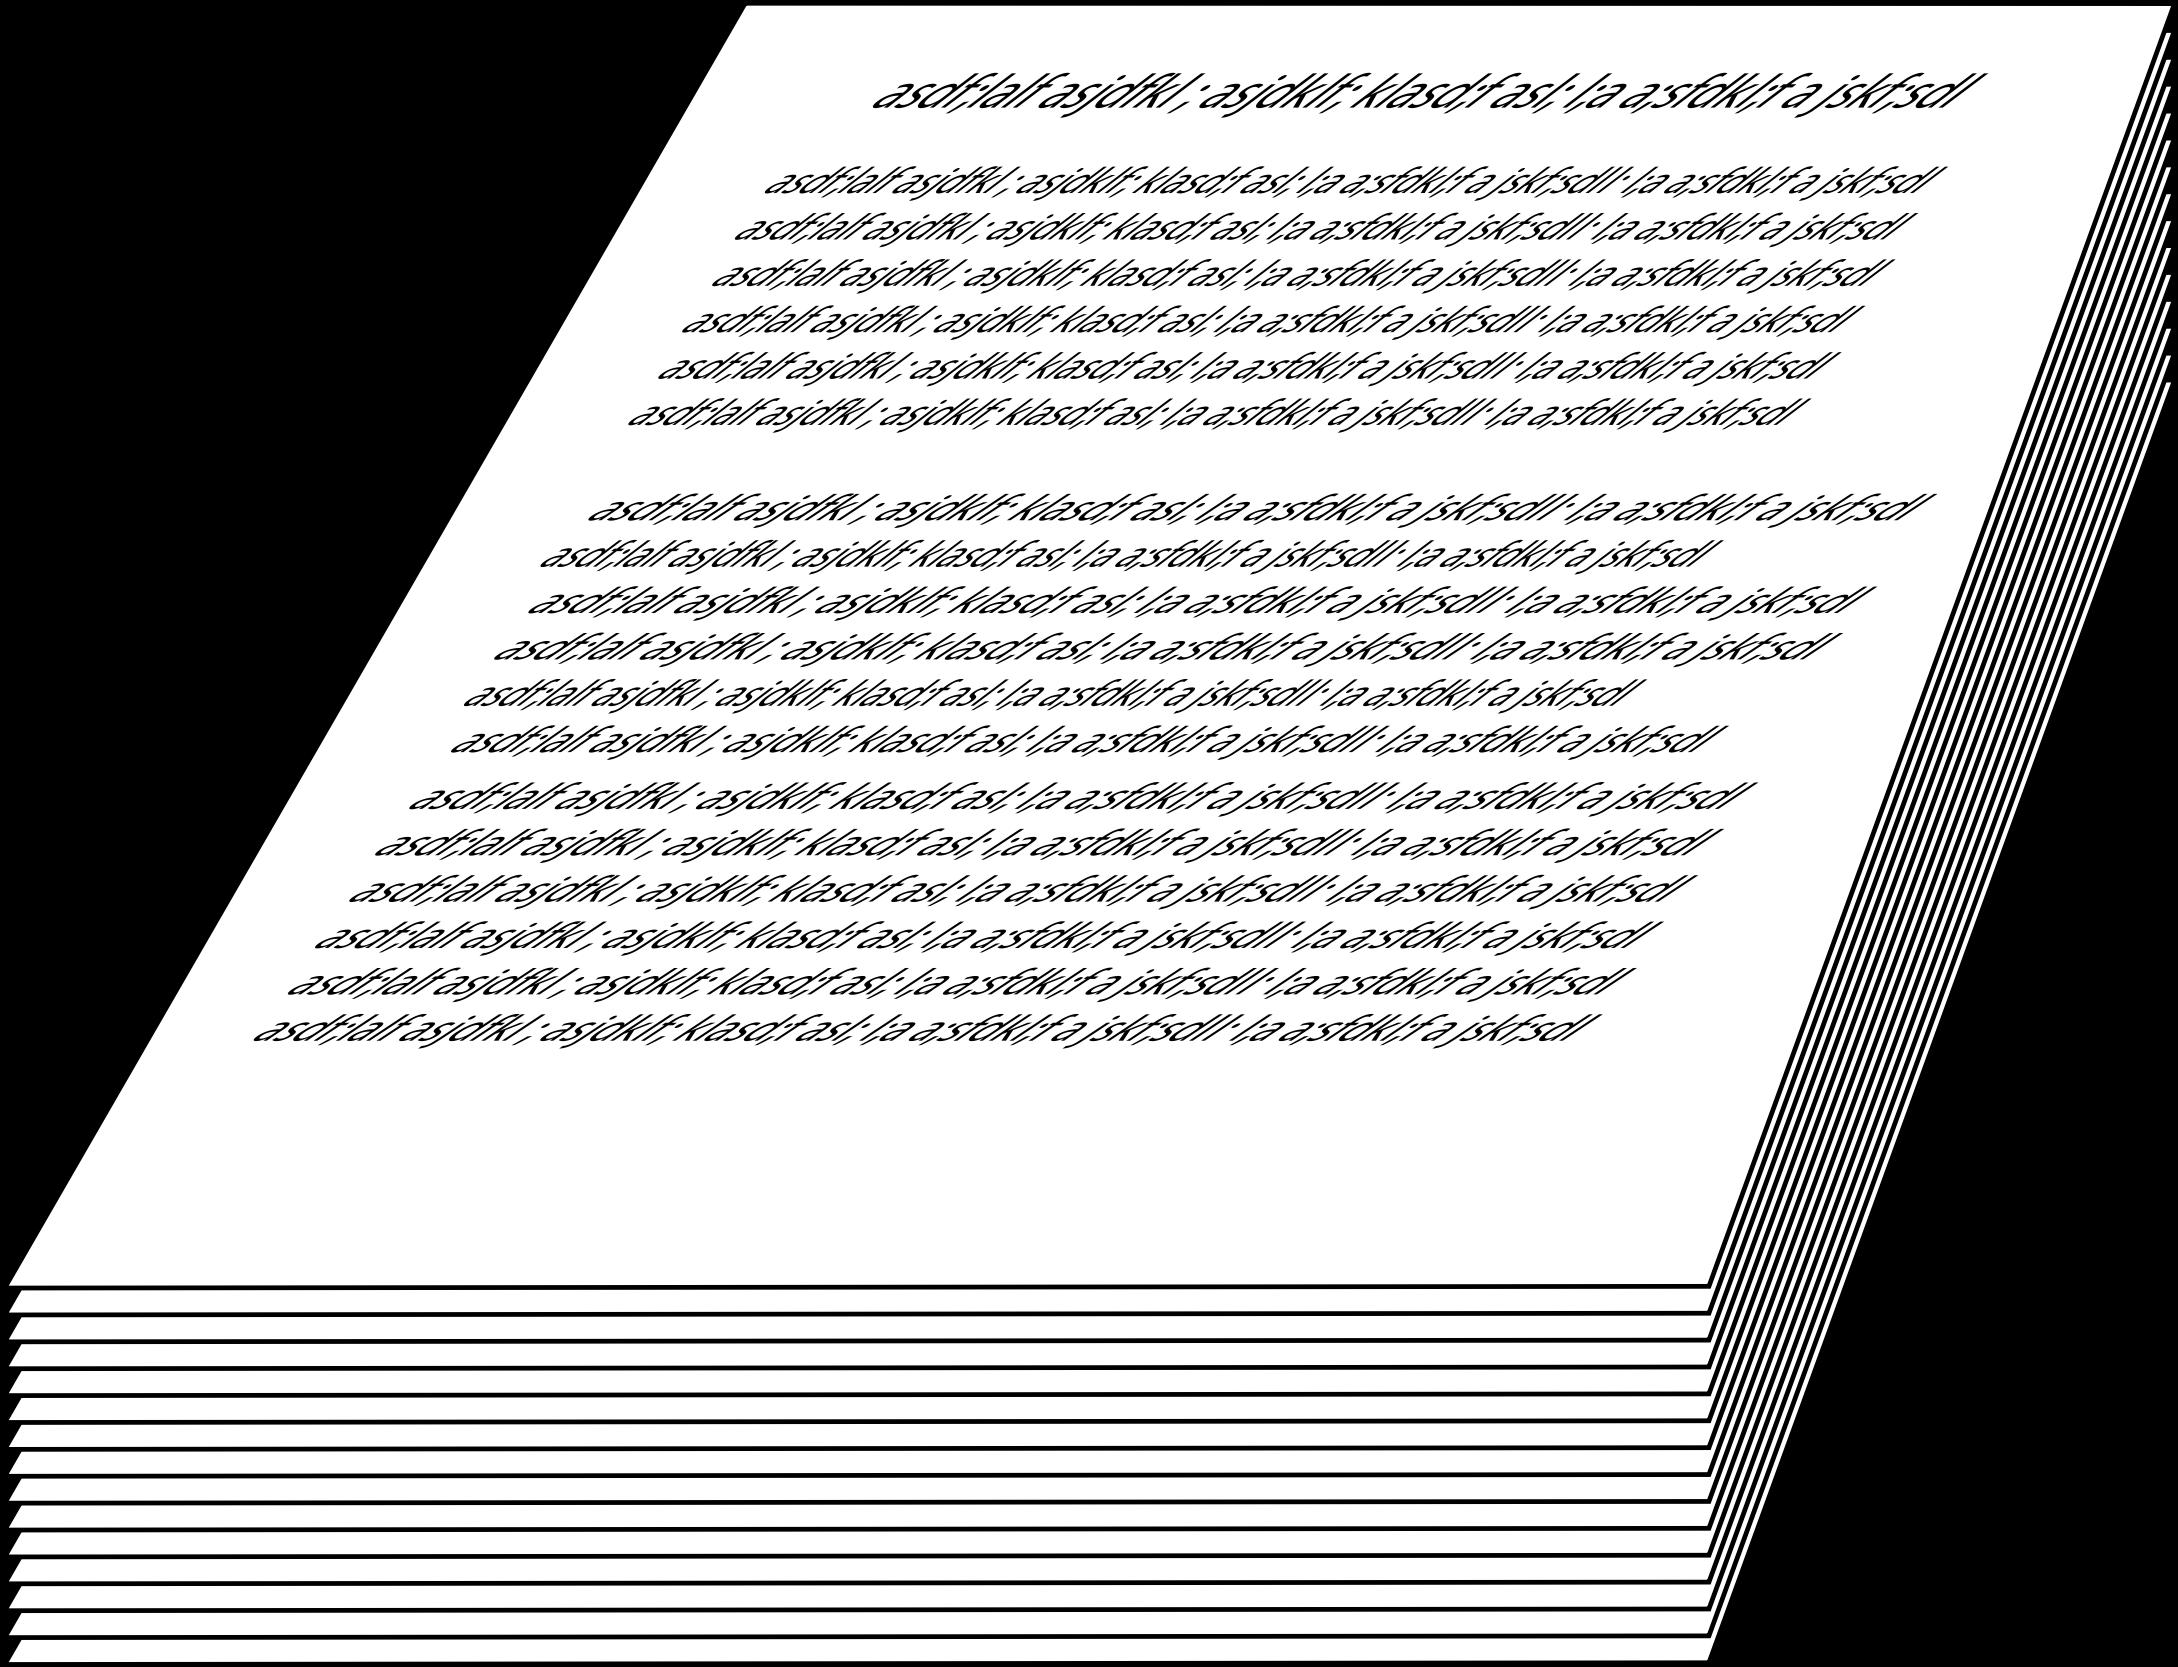 Journal clipart manuscript, Journal manuscript Transparent.